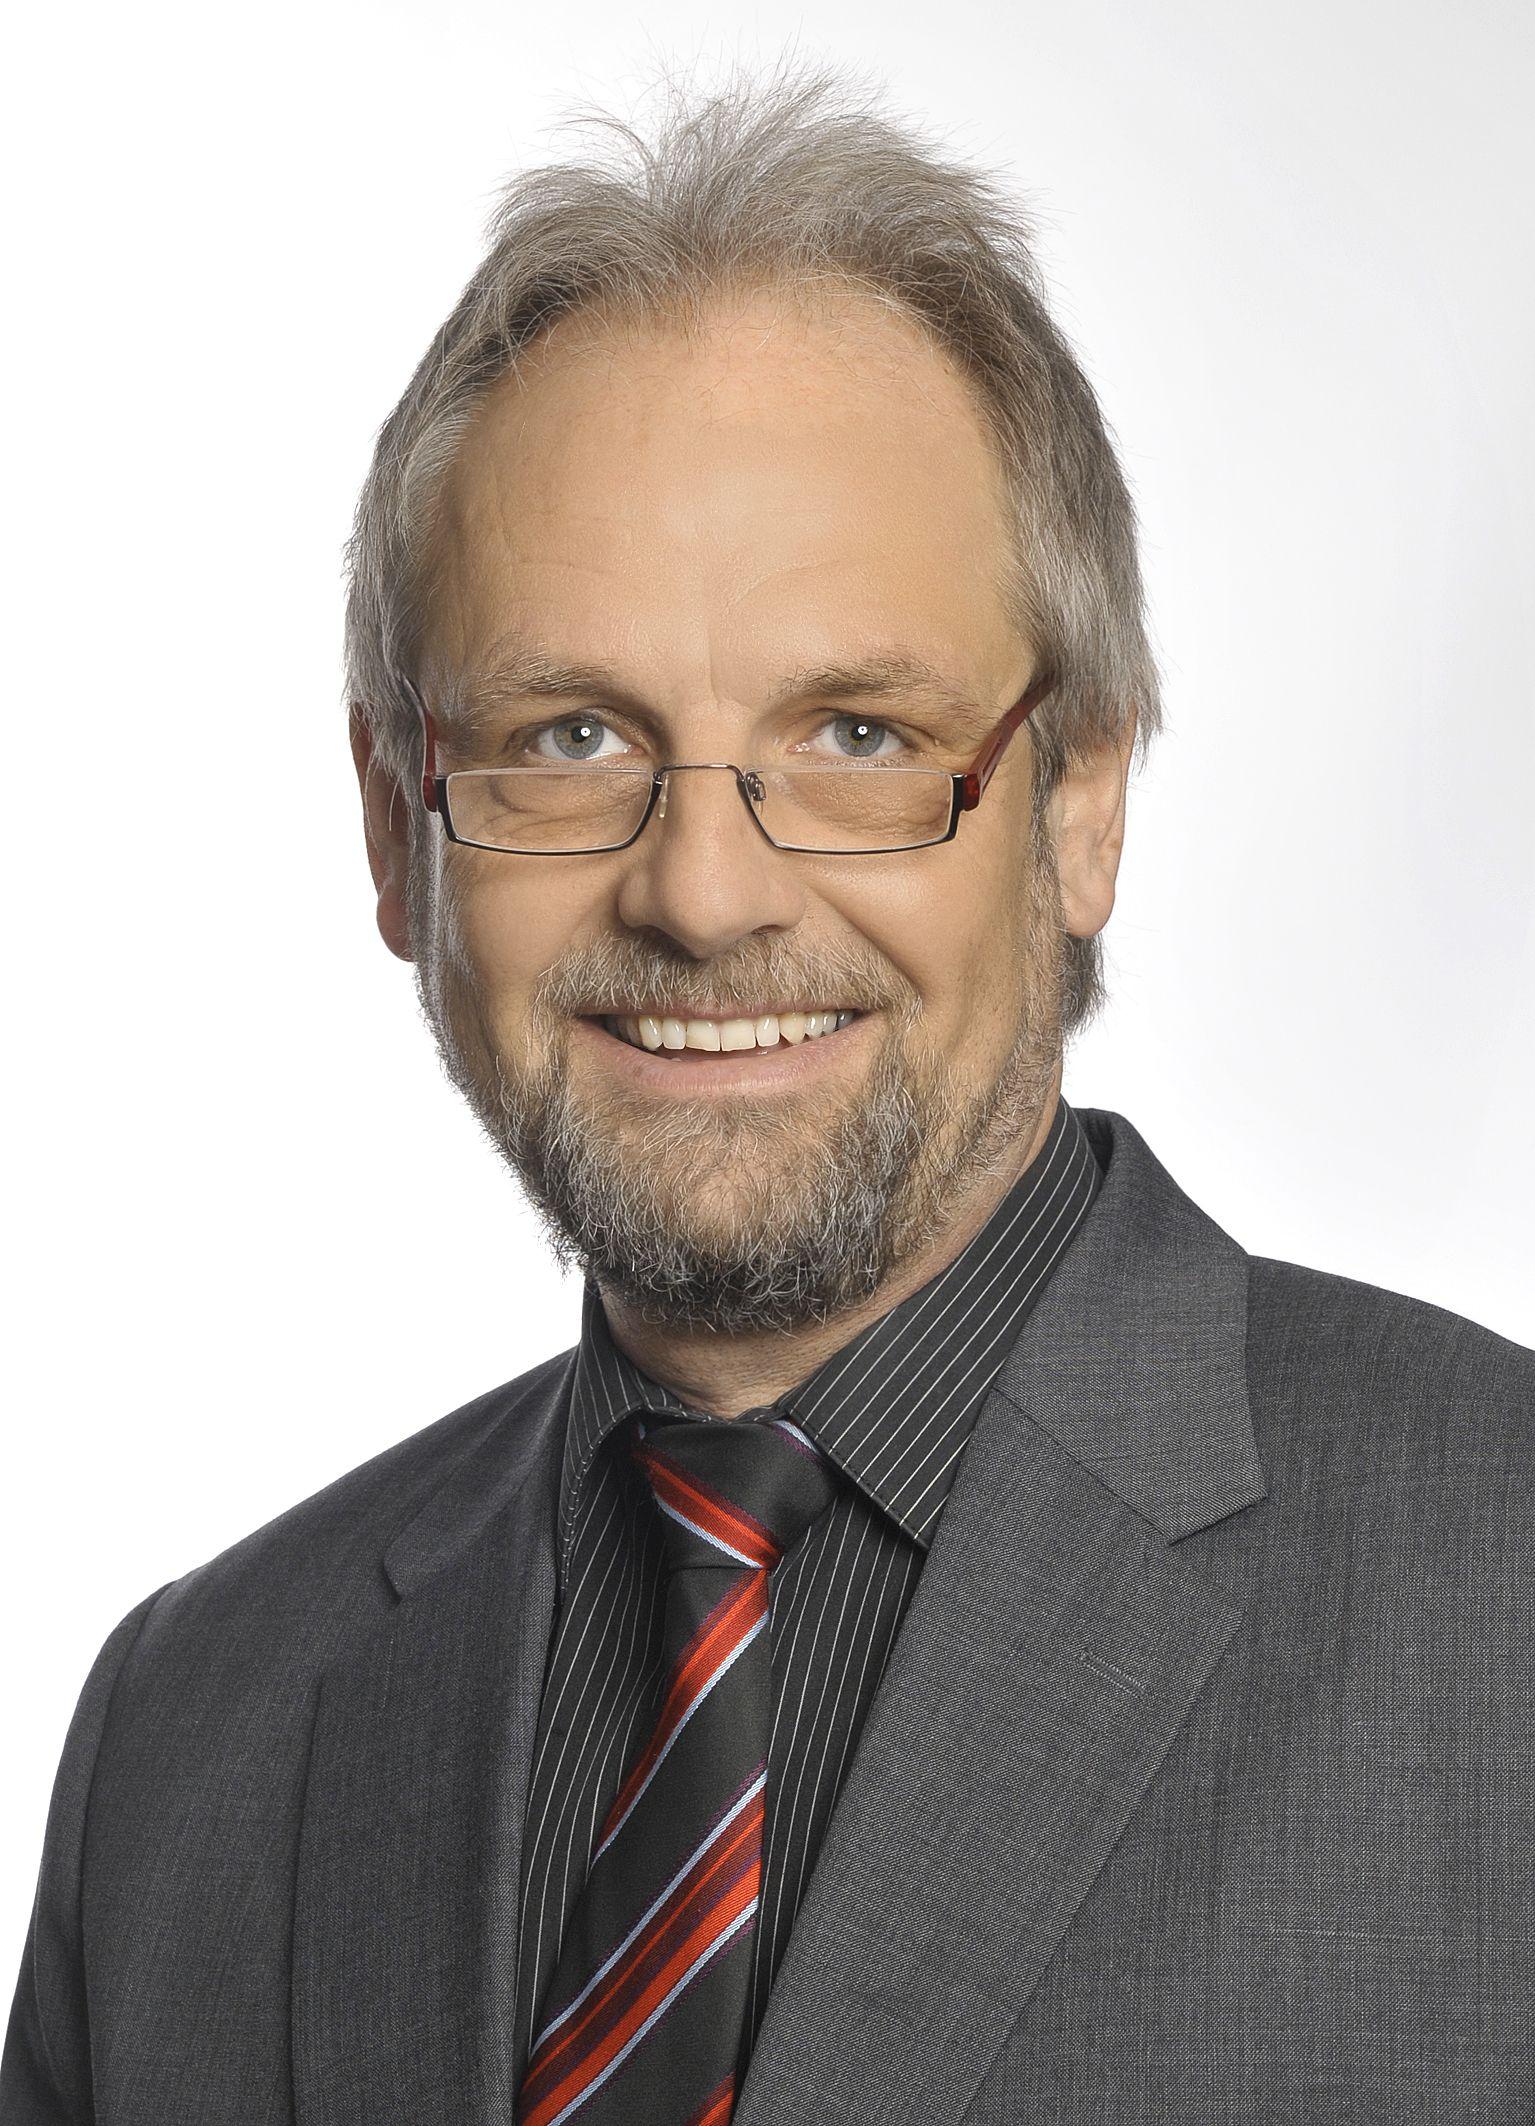 Behrensmeyer Martin Pfarrer